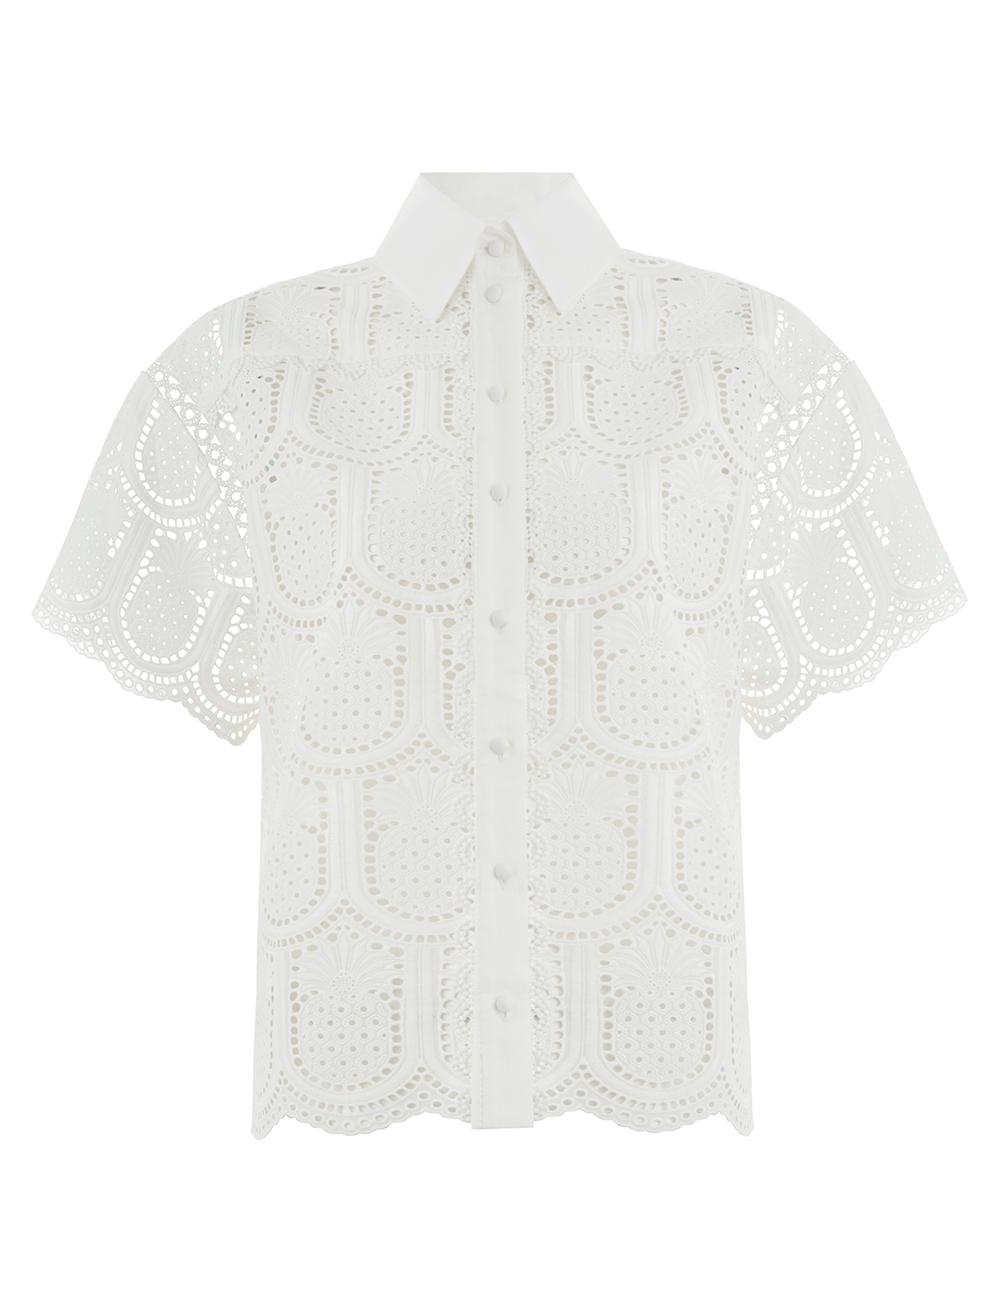 Wayfarer Embroidered Shirt